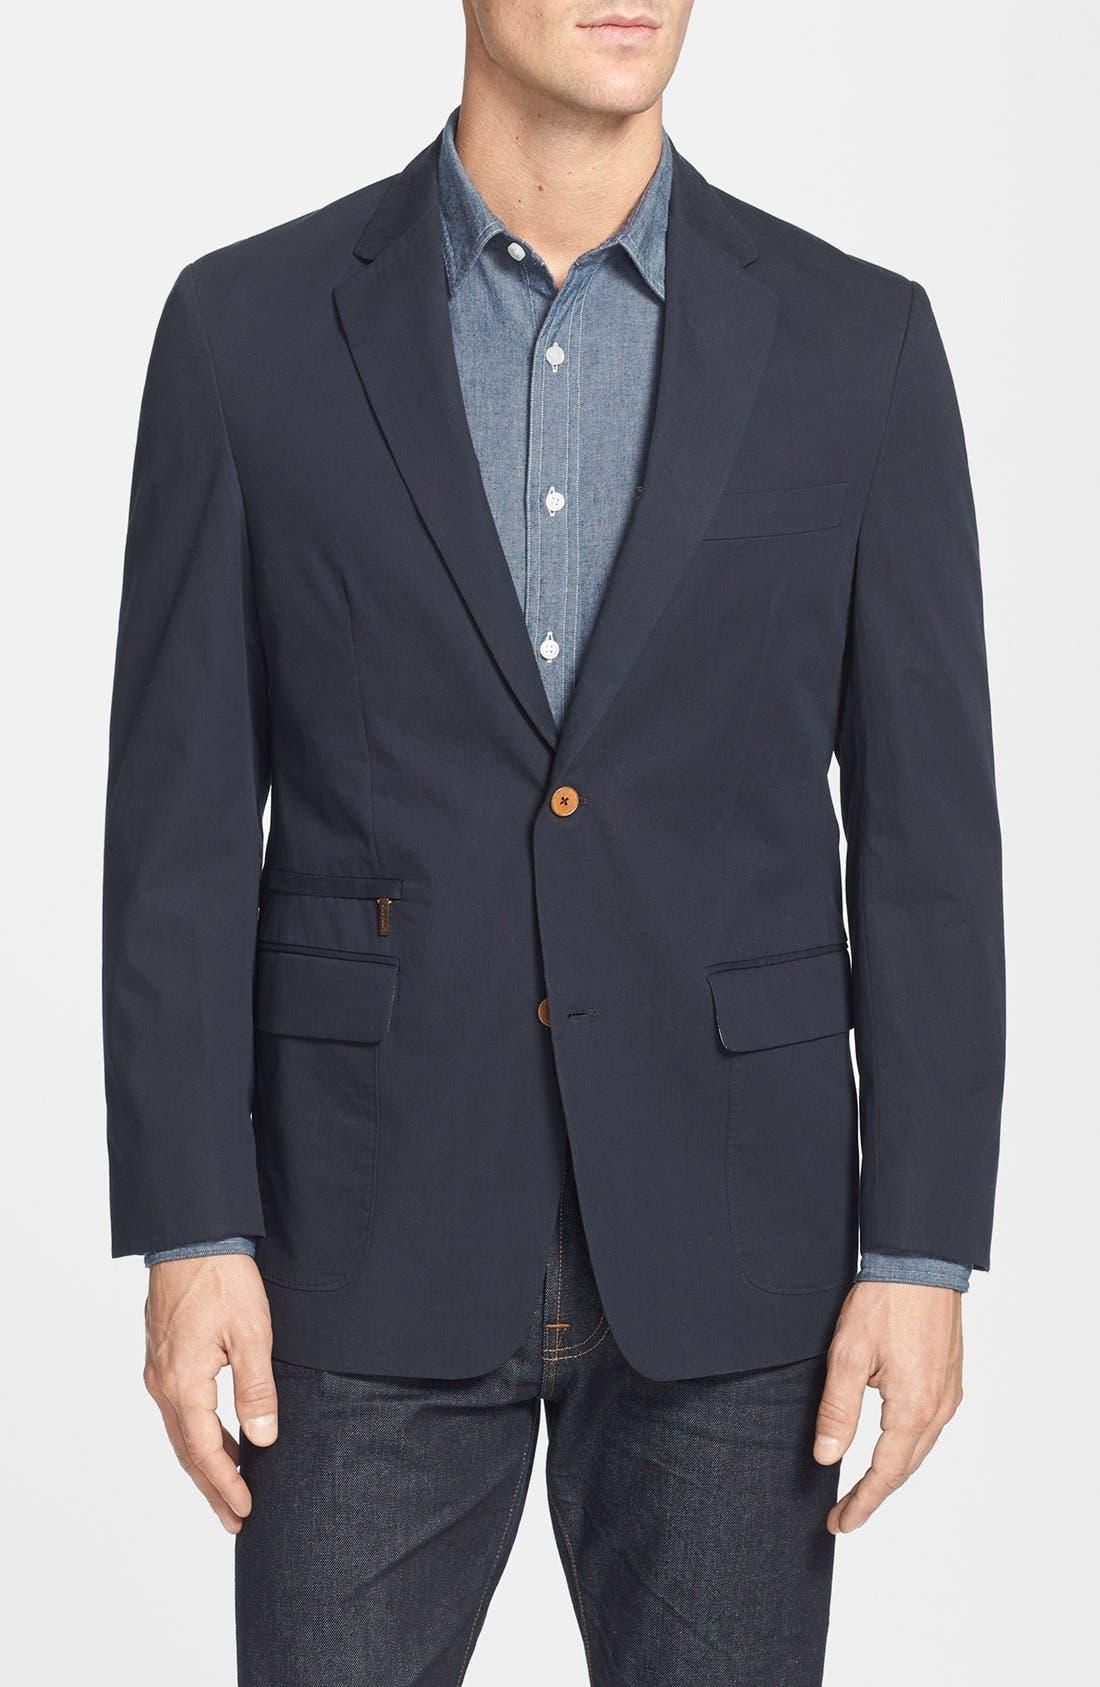 Alternate Image 1 Selected - Robert Graham 'Julian' Cotton Sportcoat